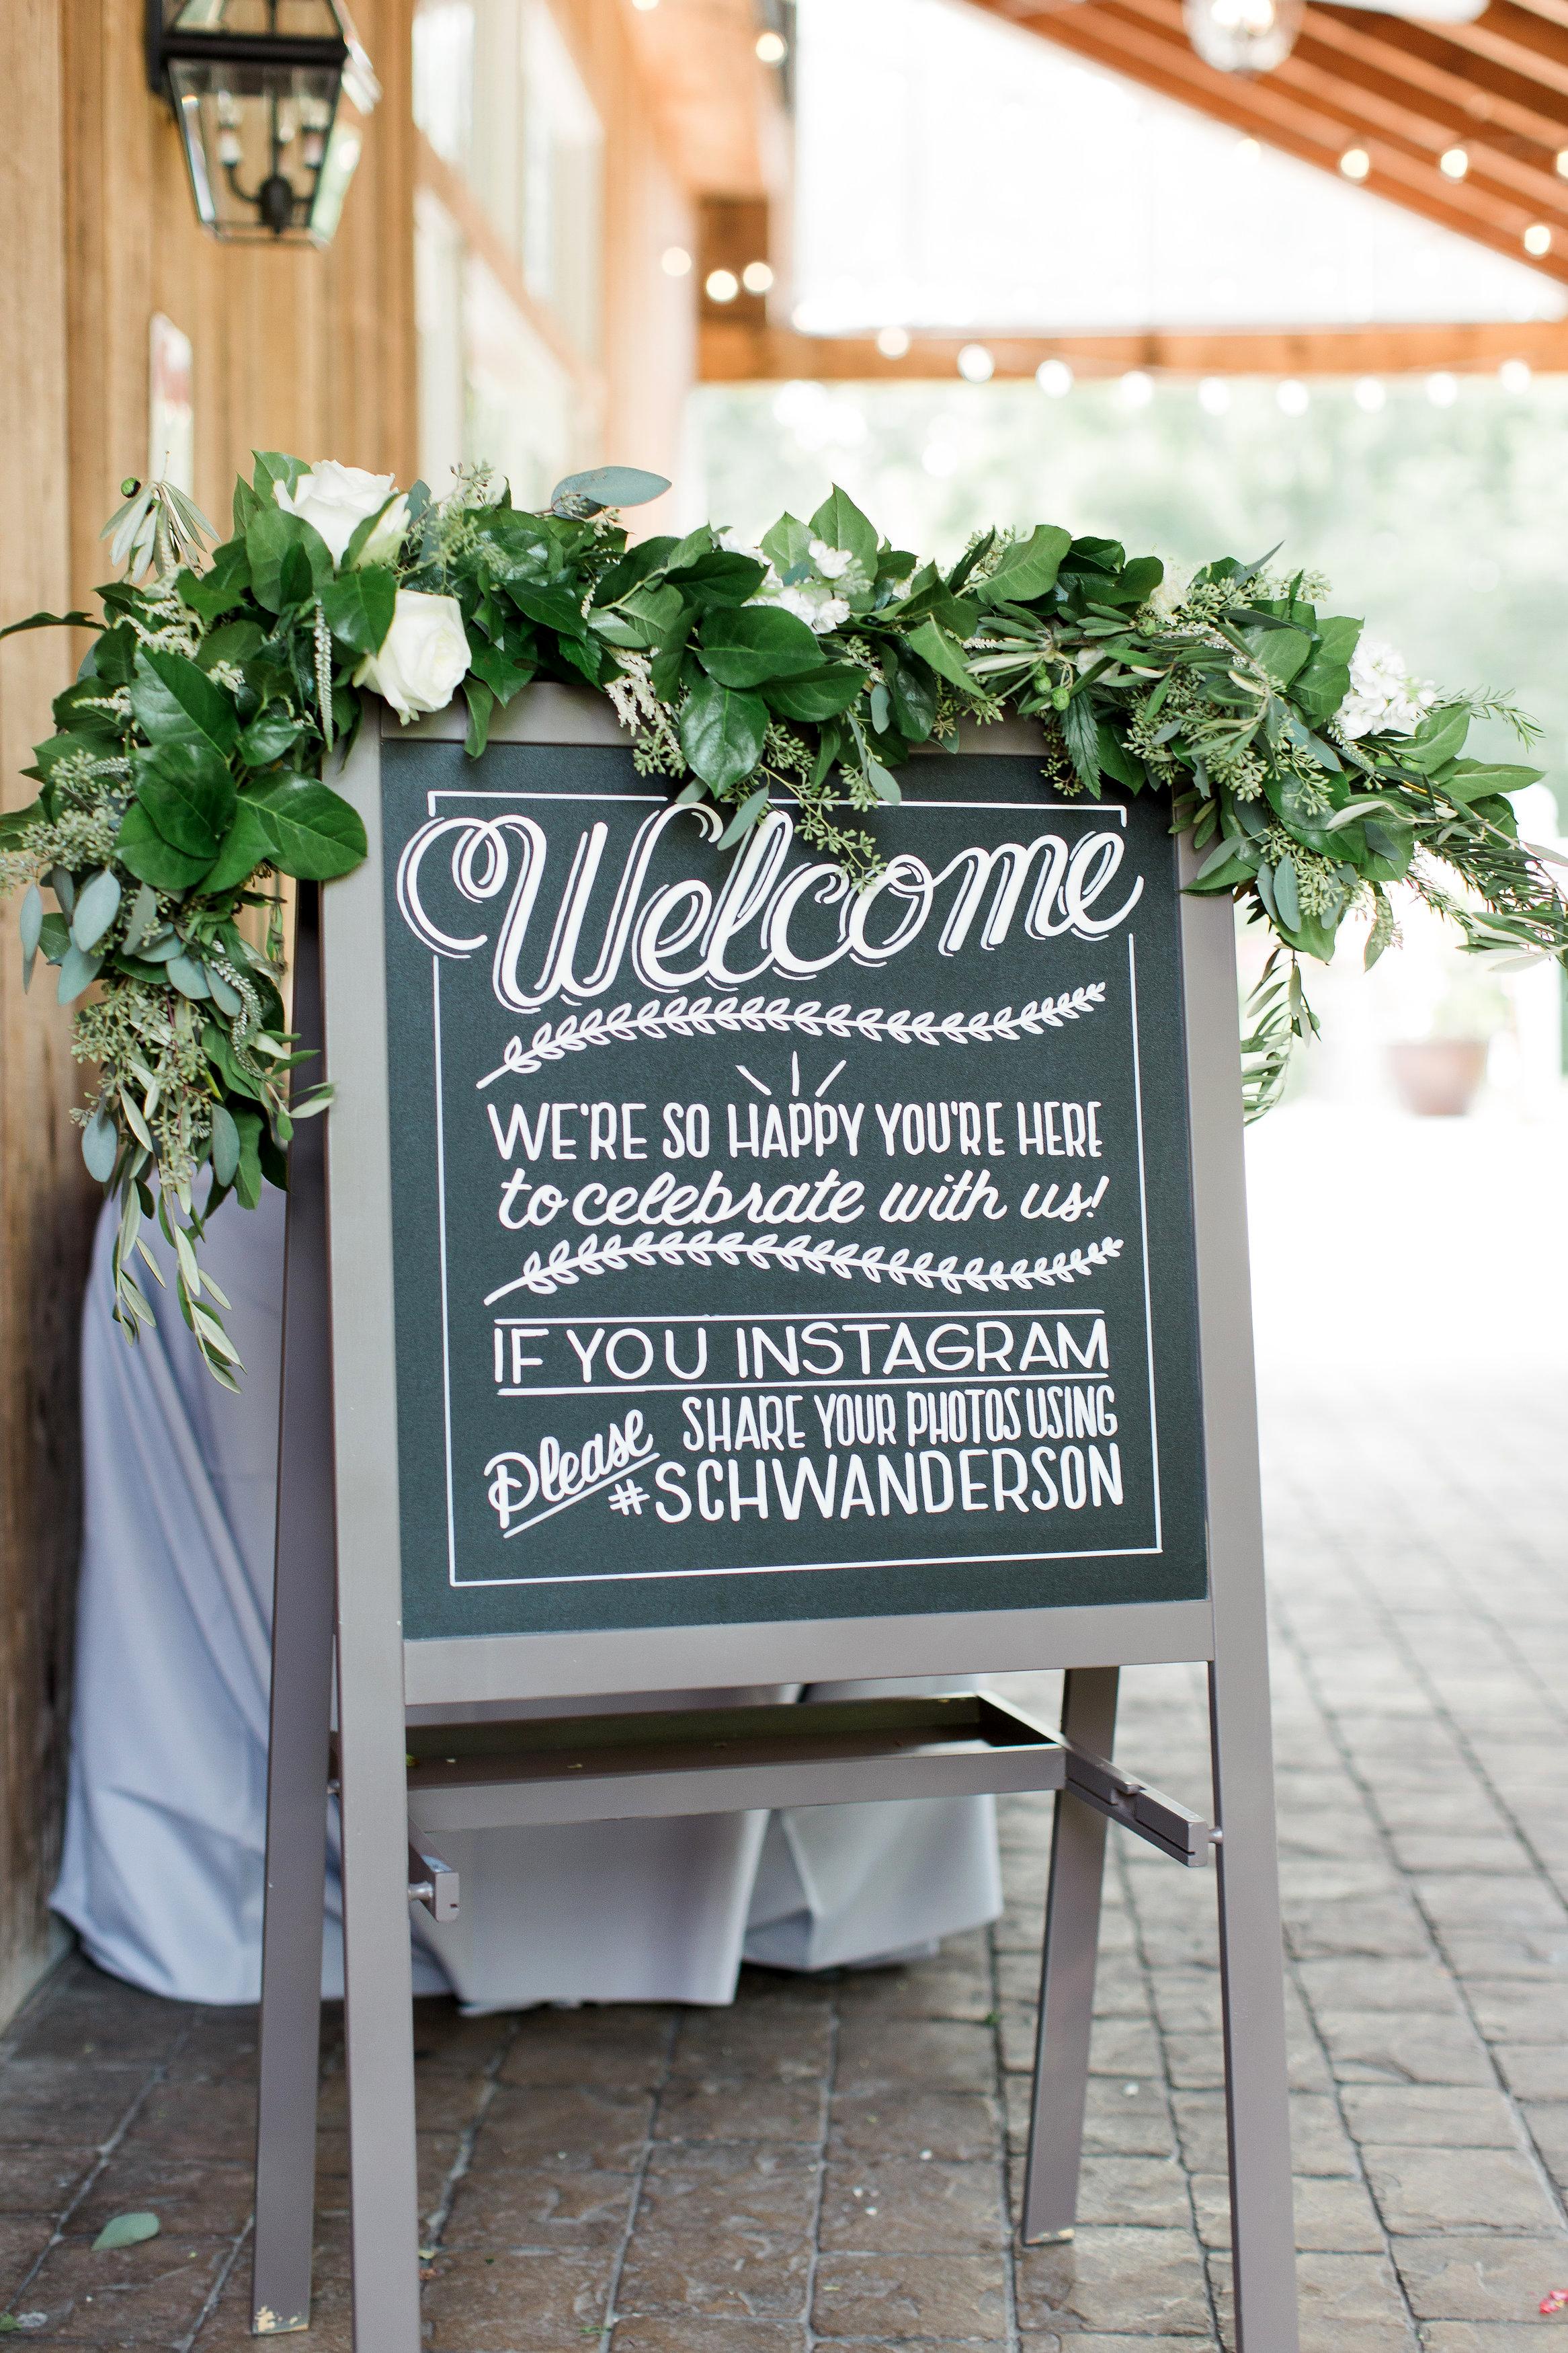 1_Weddings_Icon.jpg